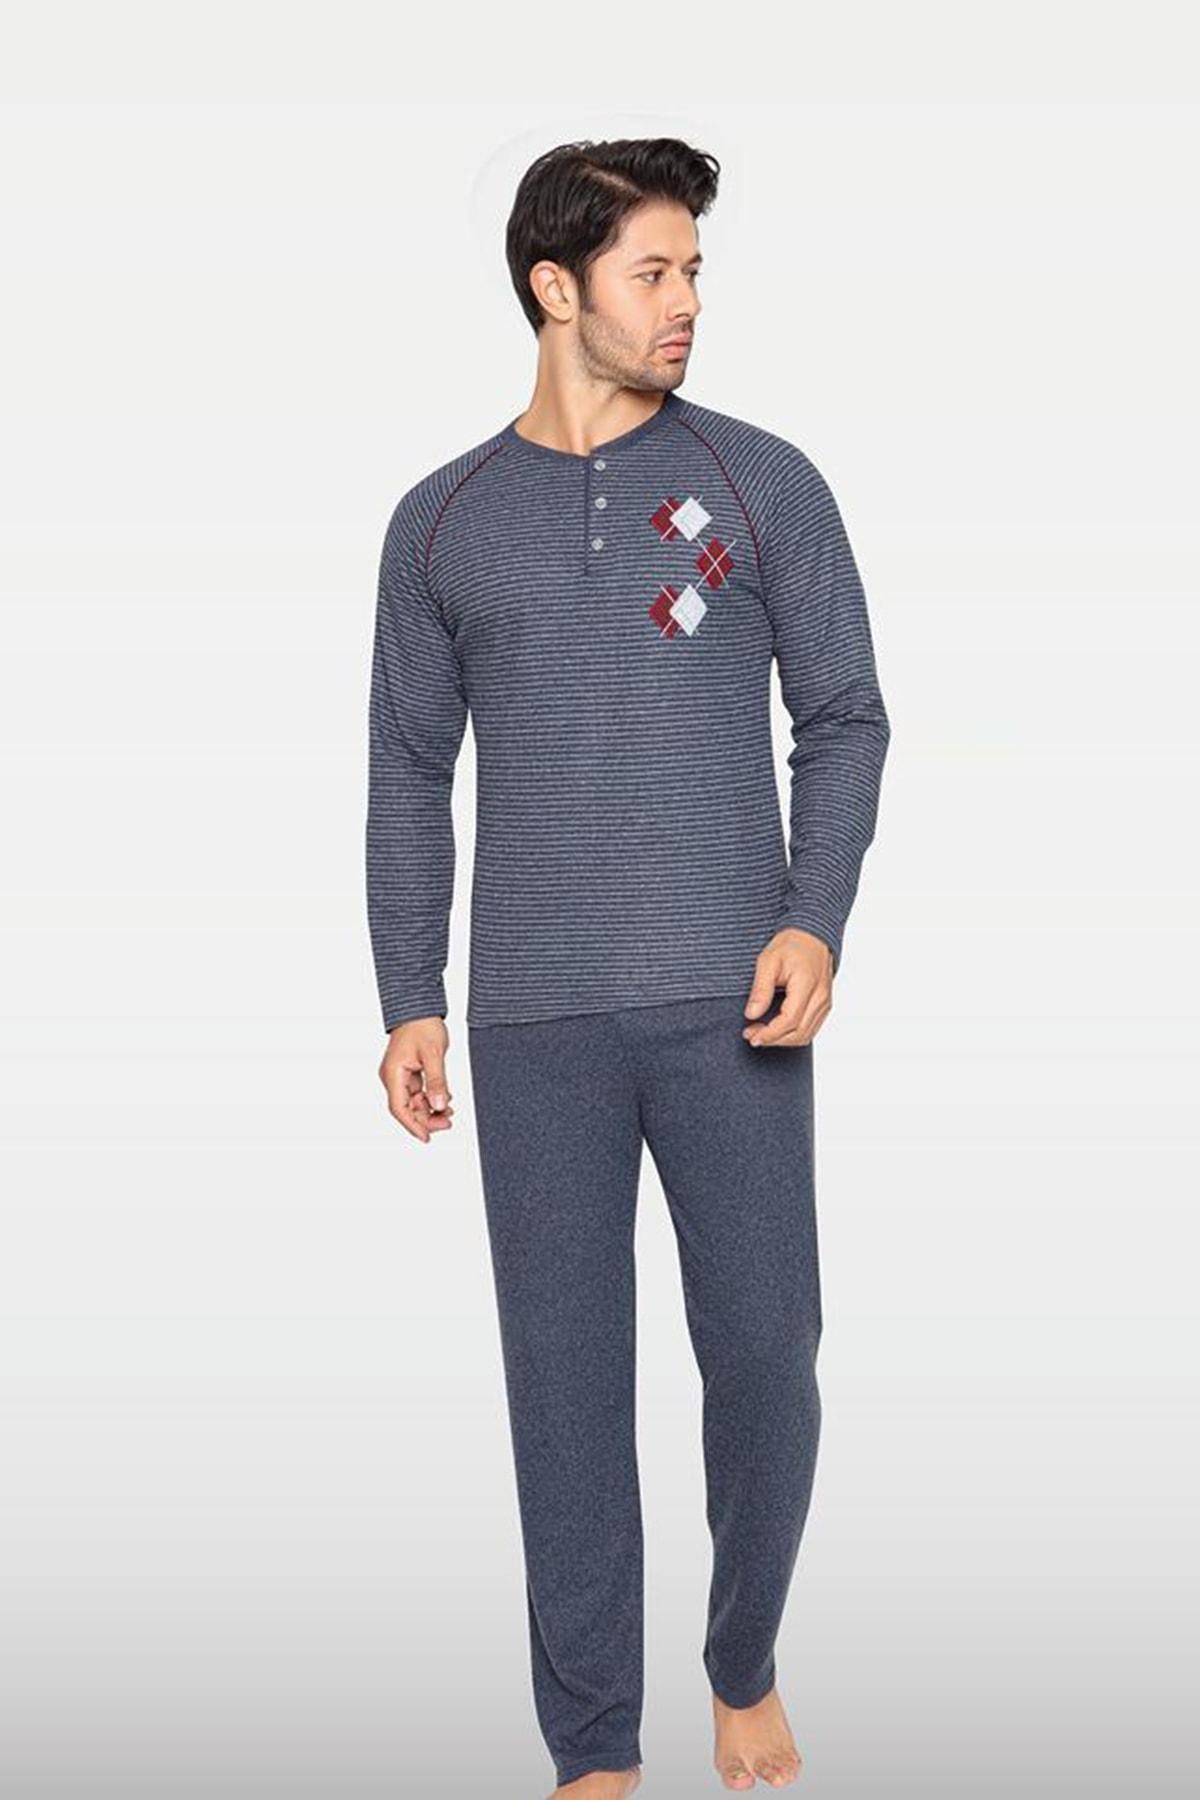 Kompedan Erkek Gri Pijama Takımı 1